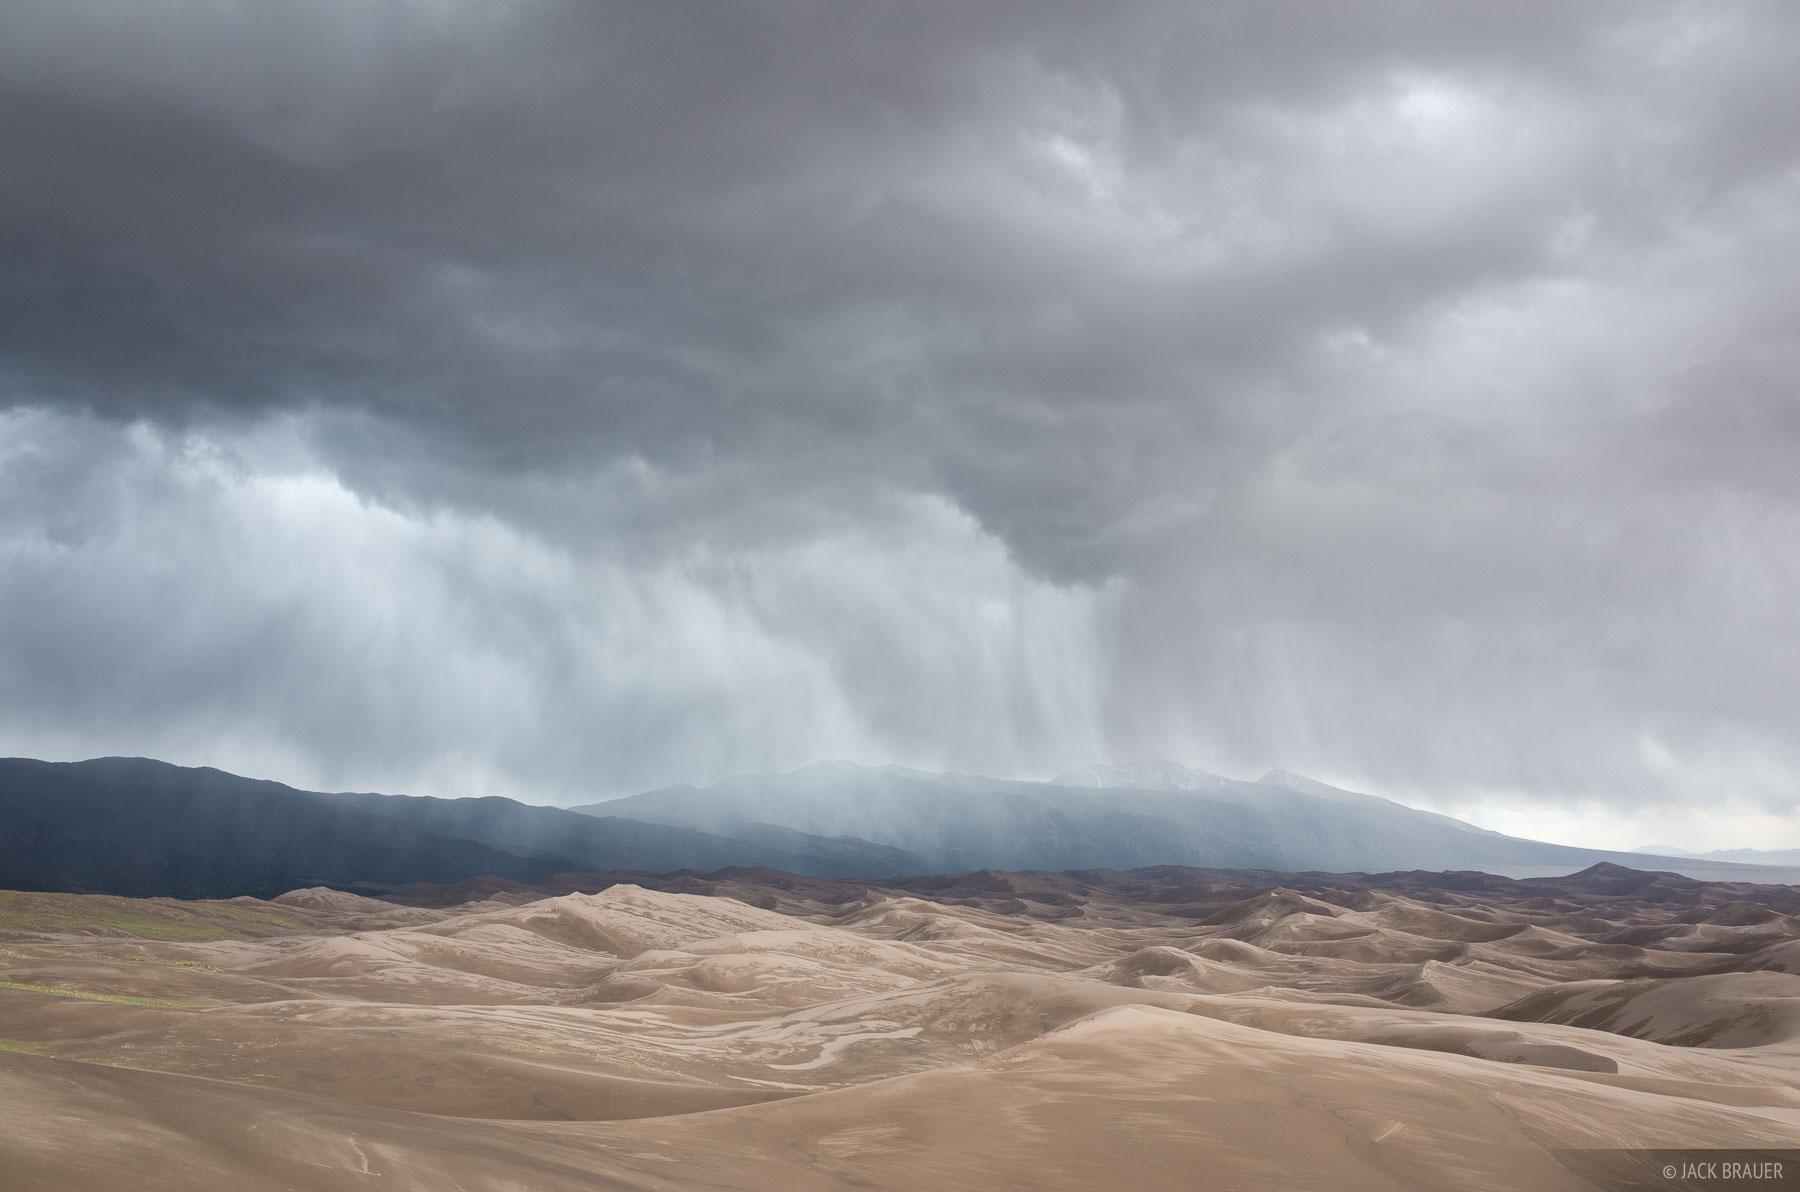 Colorado,Great Sand Dunes, storm, photo